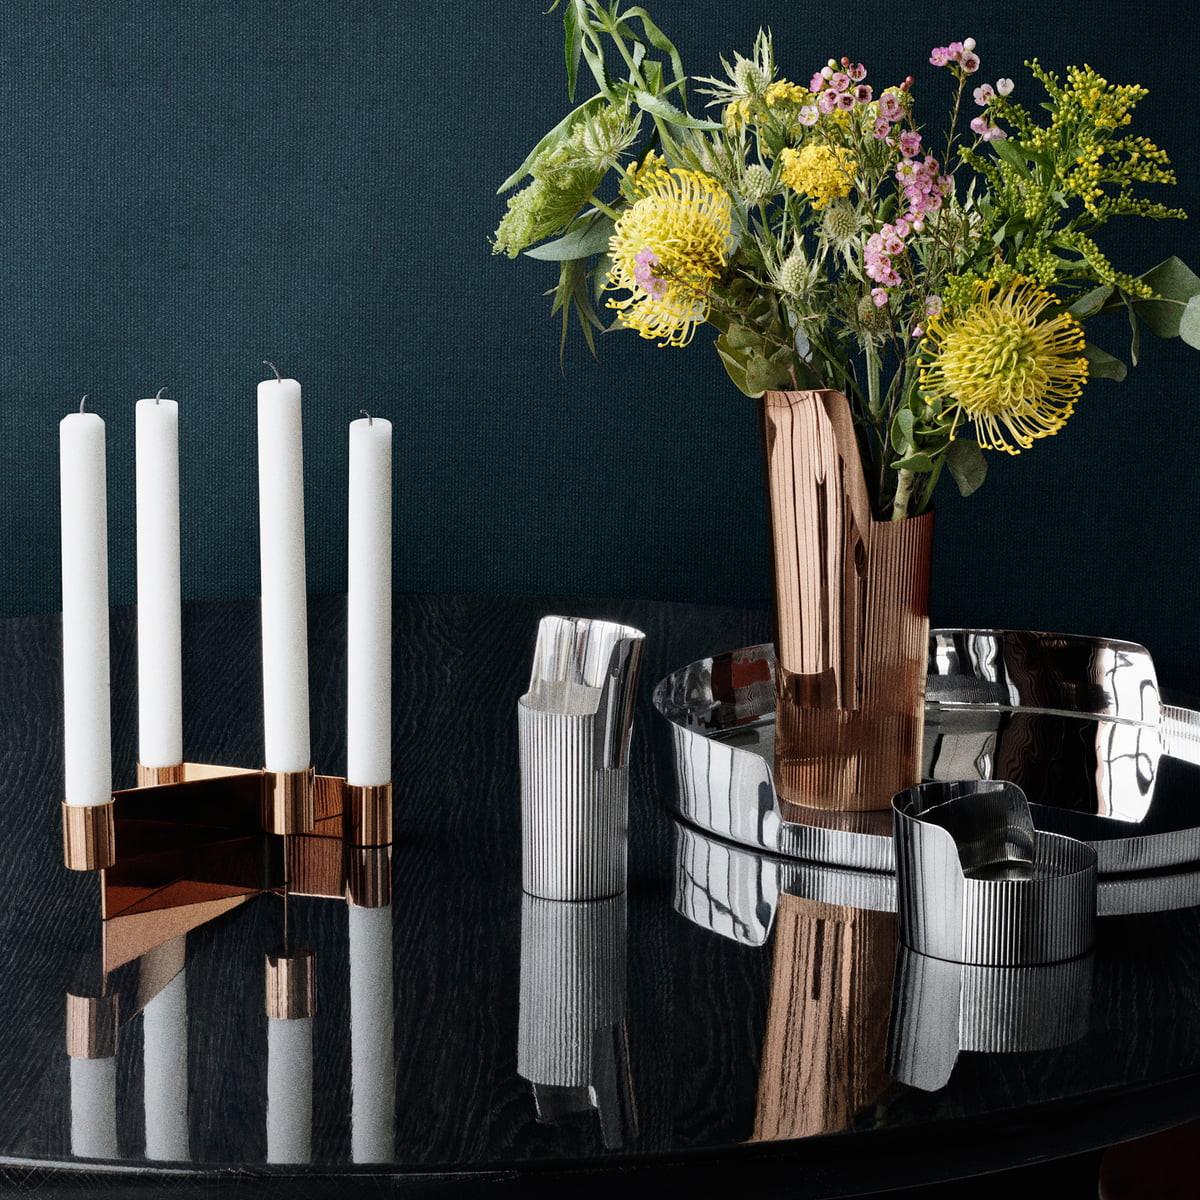 george jensen vase of urkiola candlesticks by georg jensen in the shop in the diversity of the urkiola collection a· georg jensen